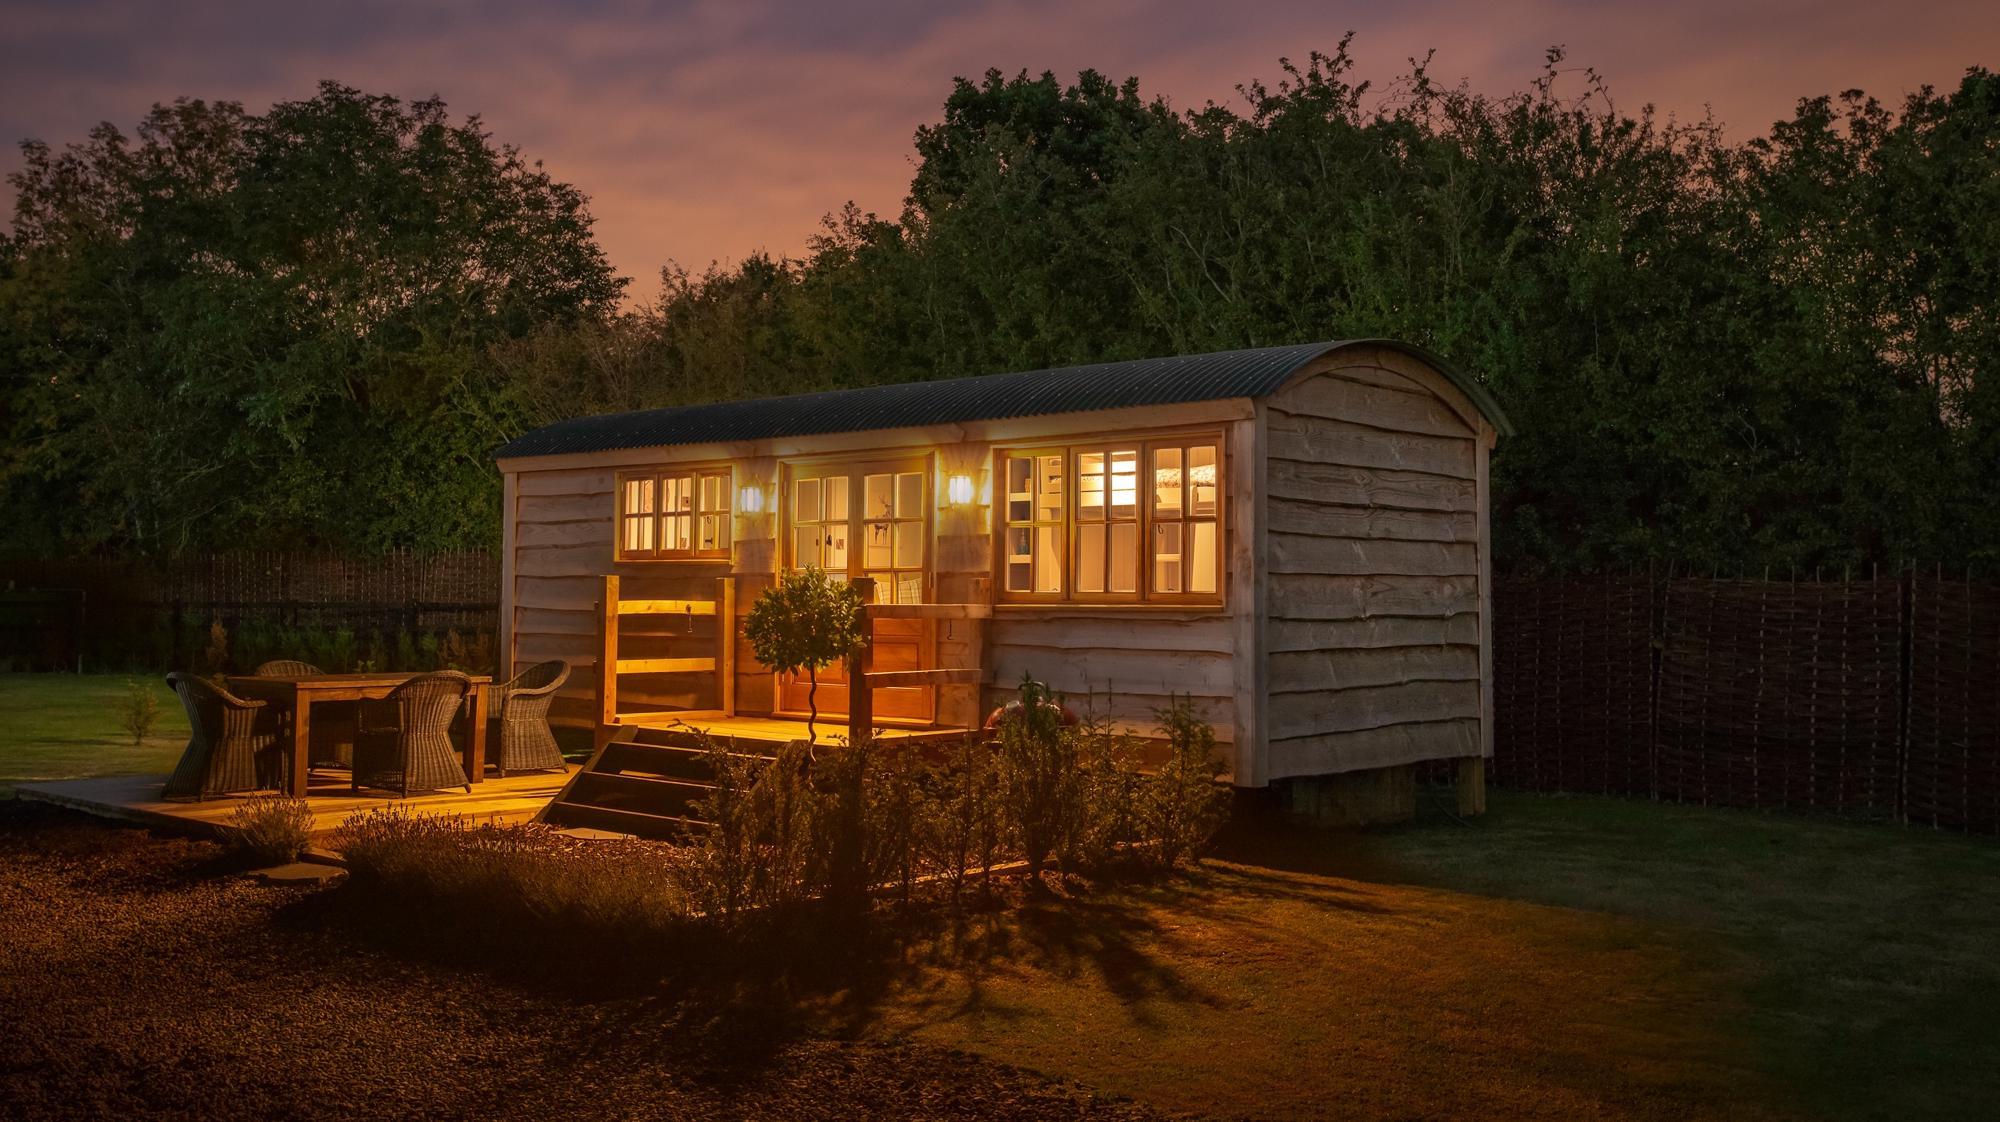 Shepherd's Huts in England